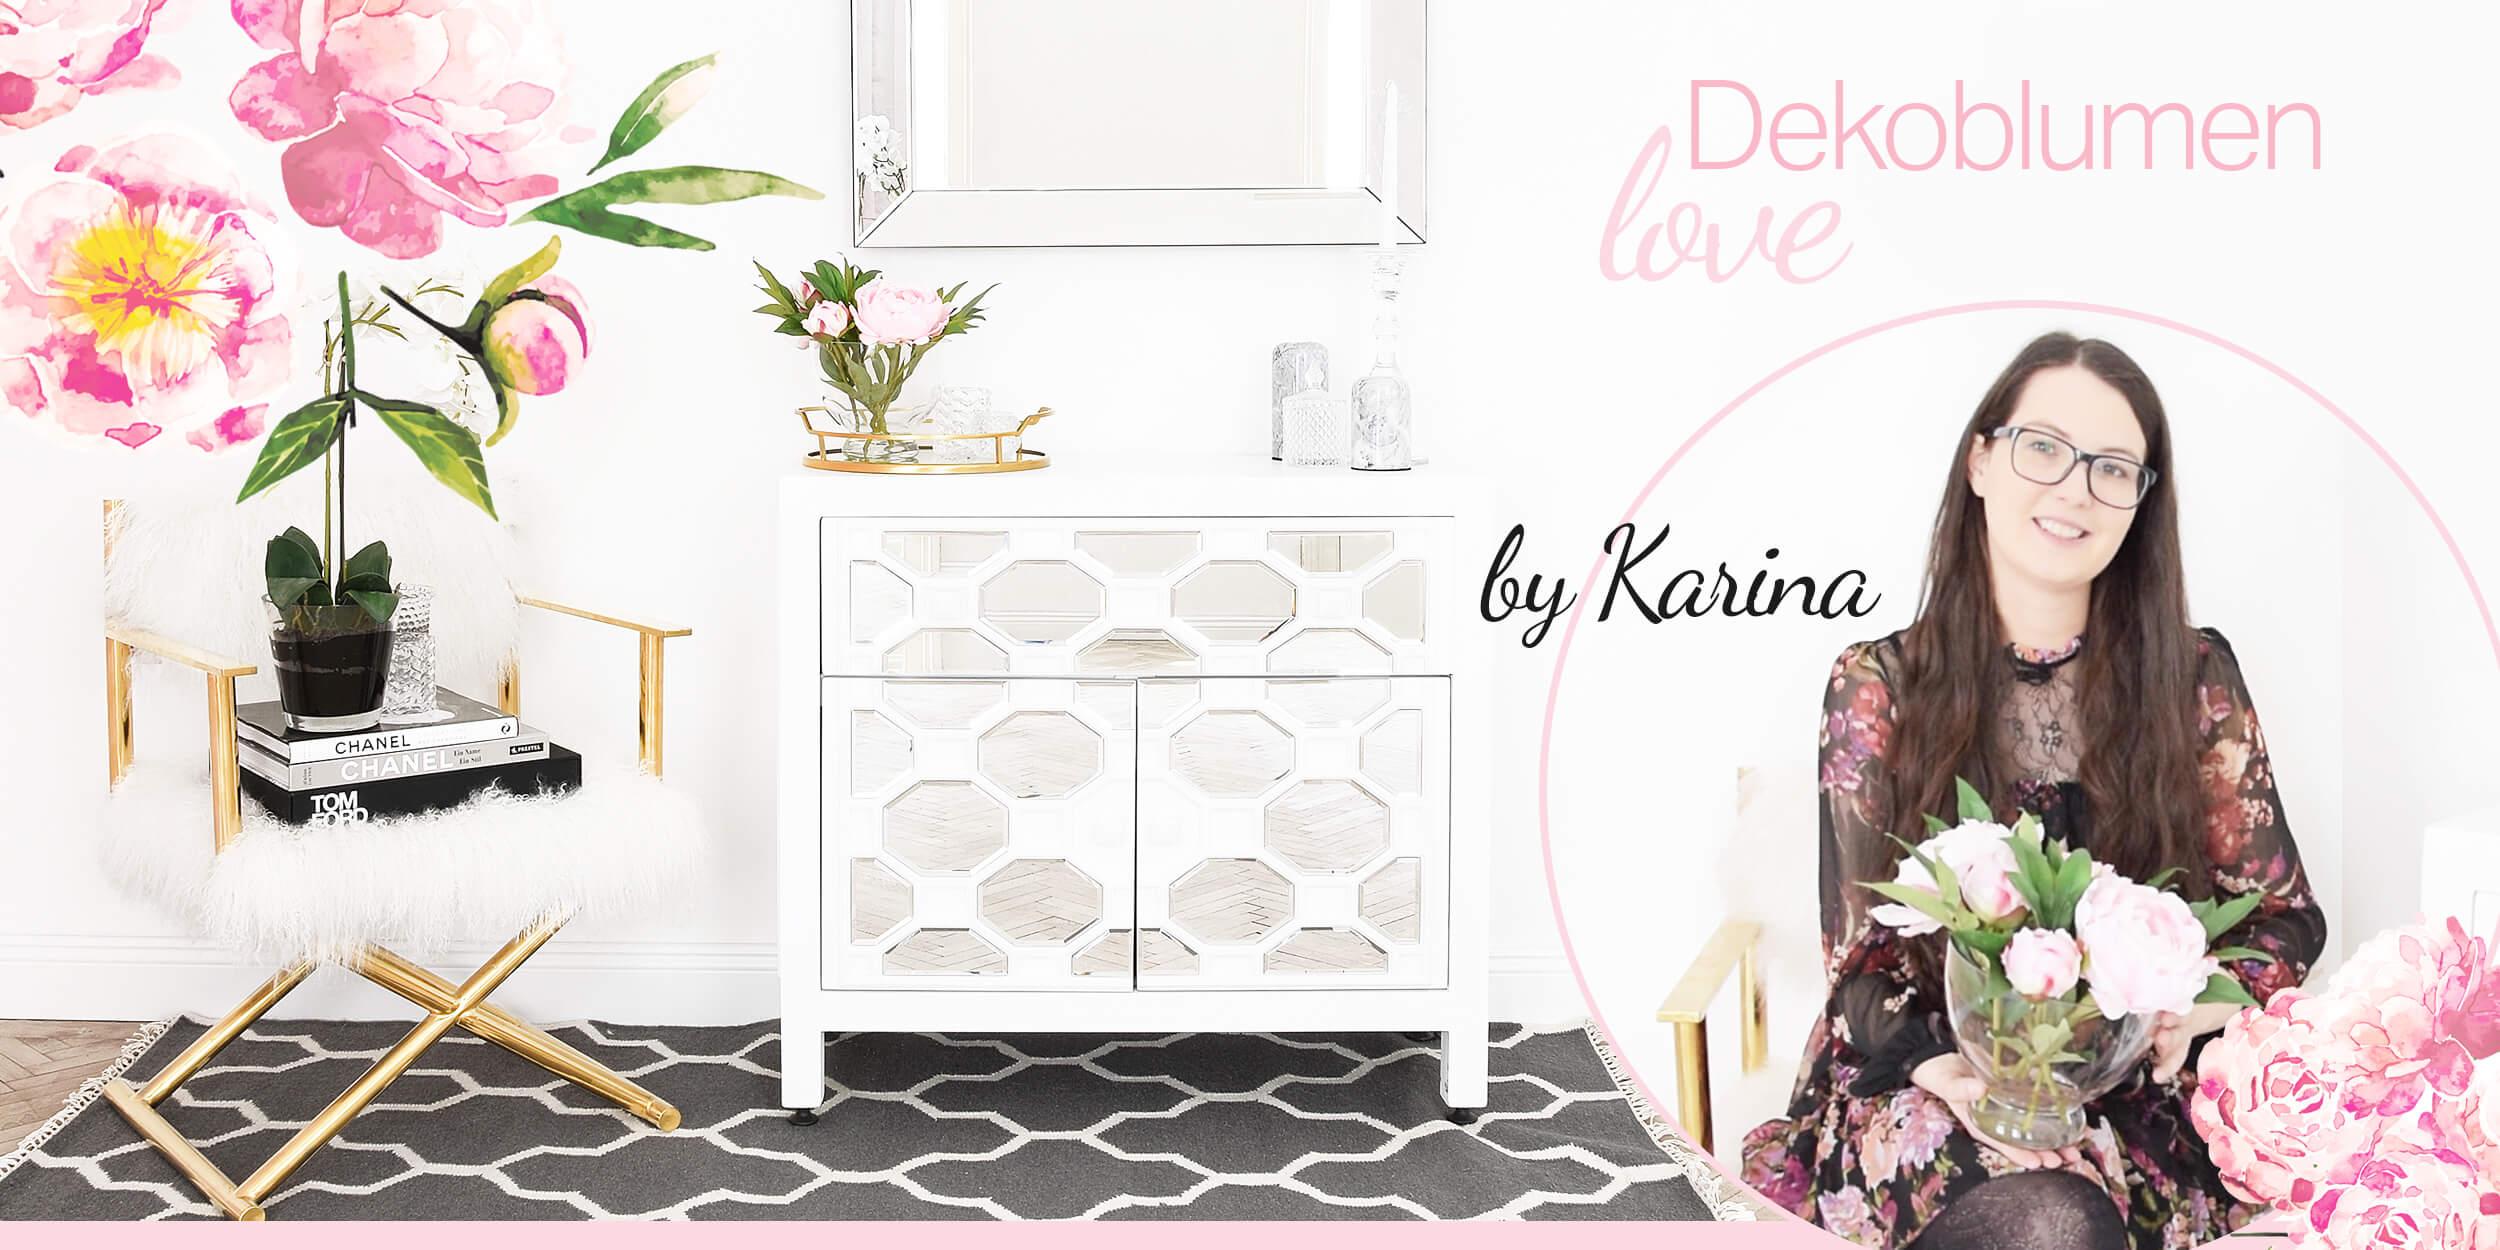 It-Piece Deko-Blumen Love